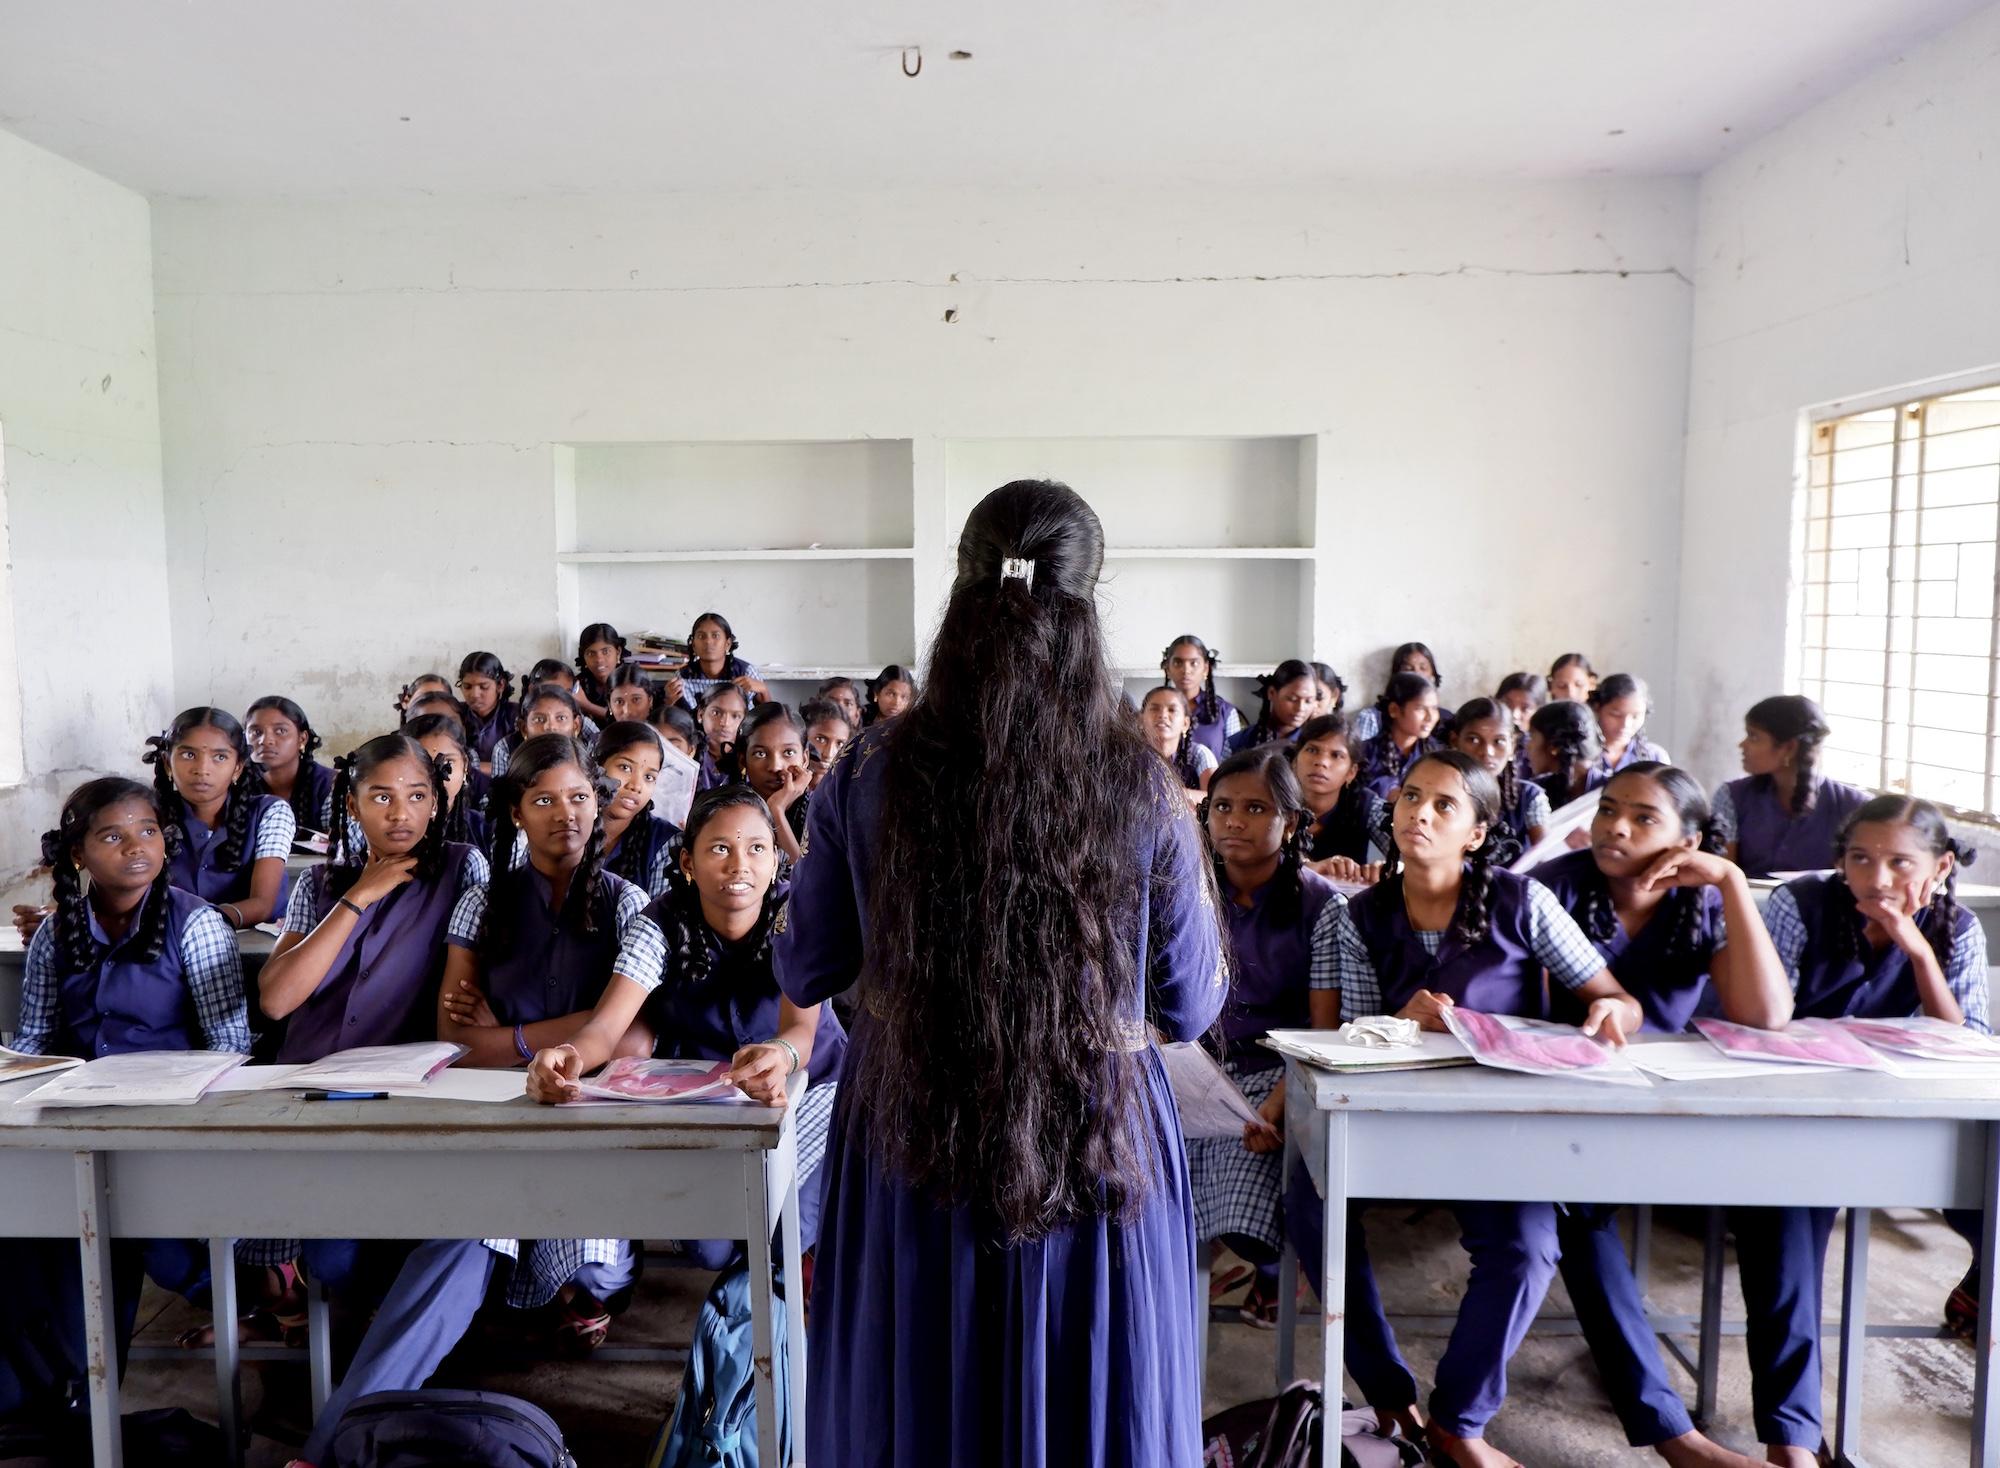 menstrual hygiene education